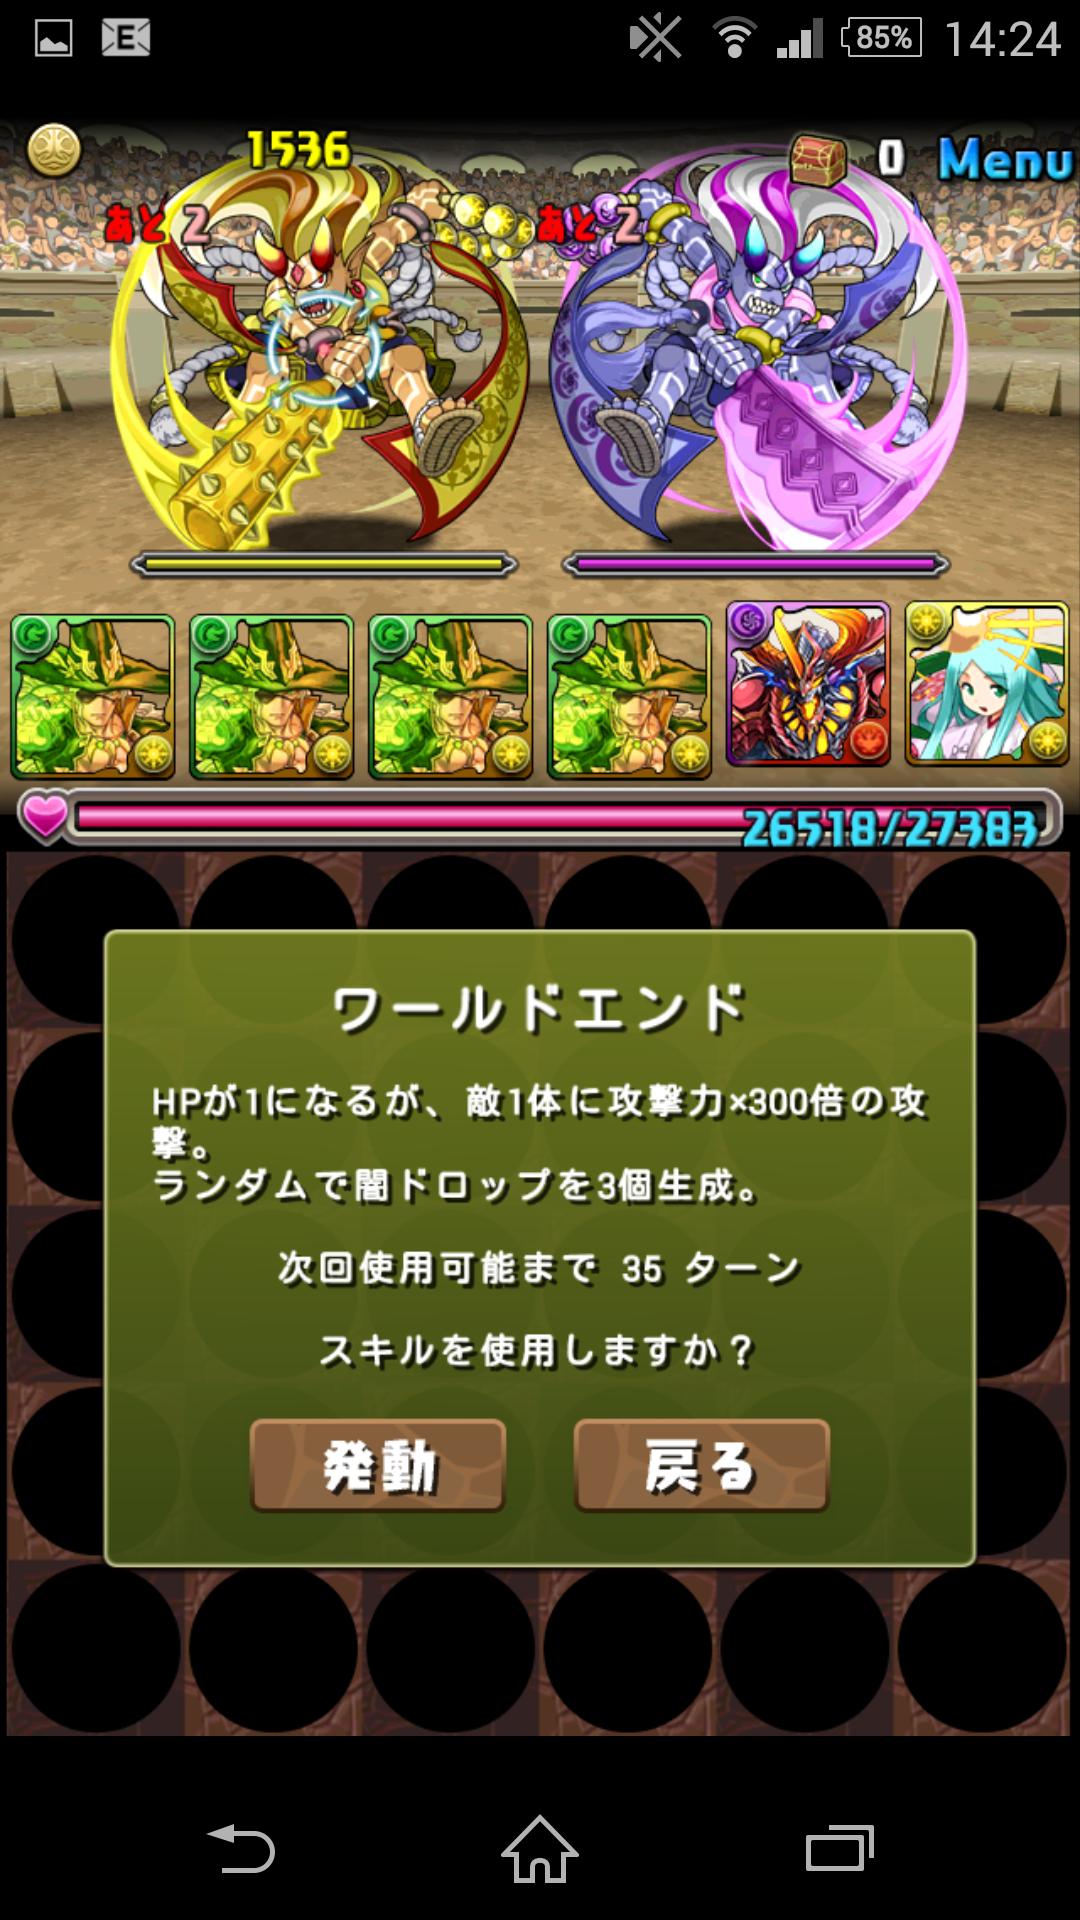 Screenshot_2015-01-29-14-24-22.png